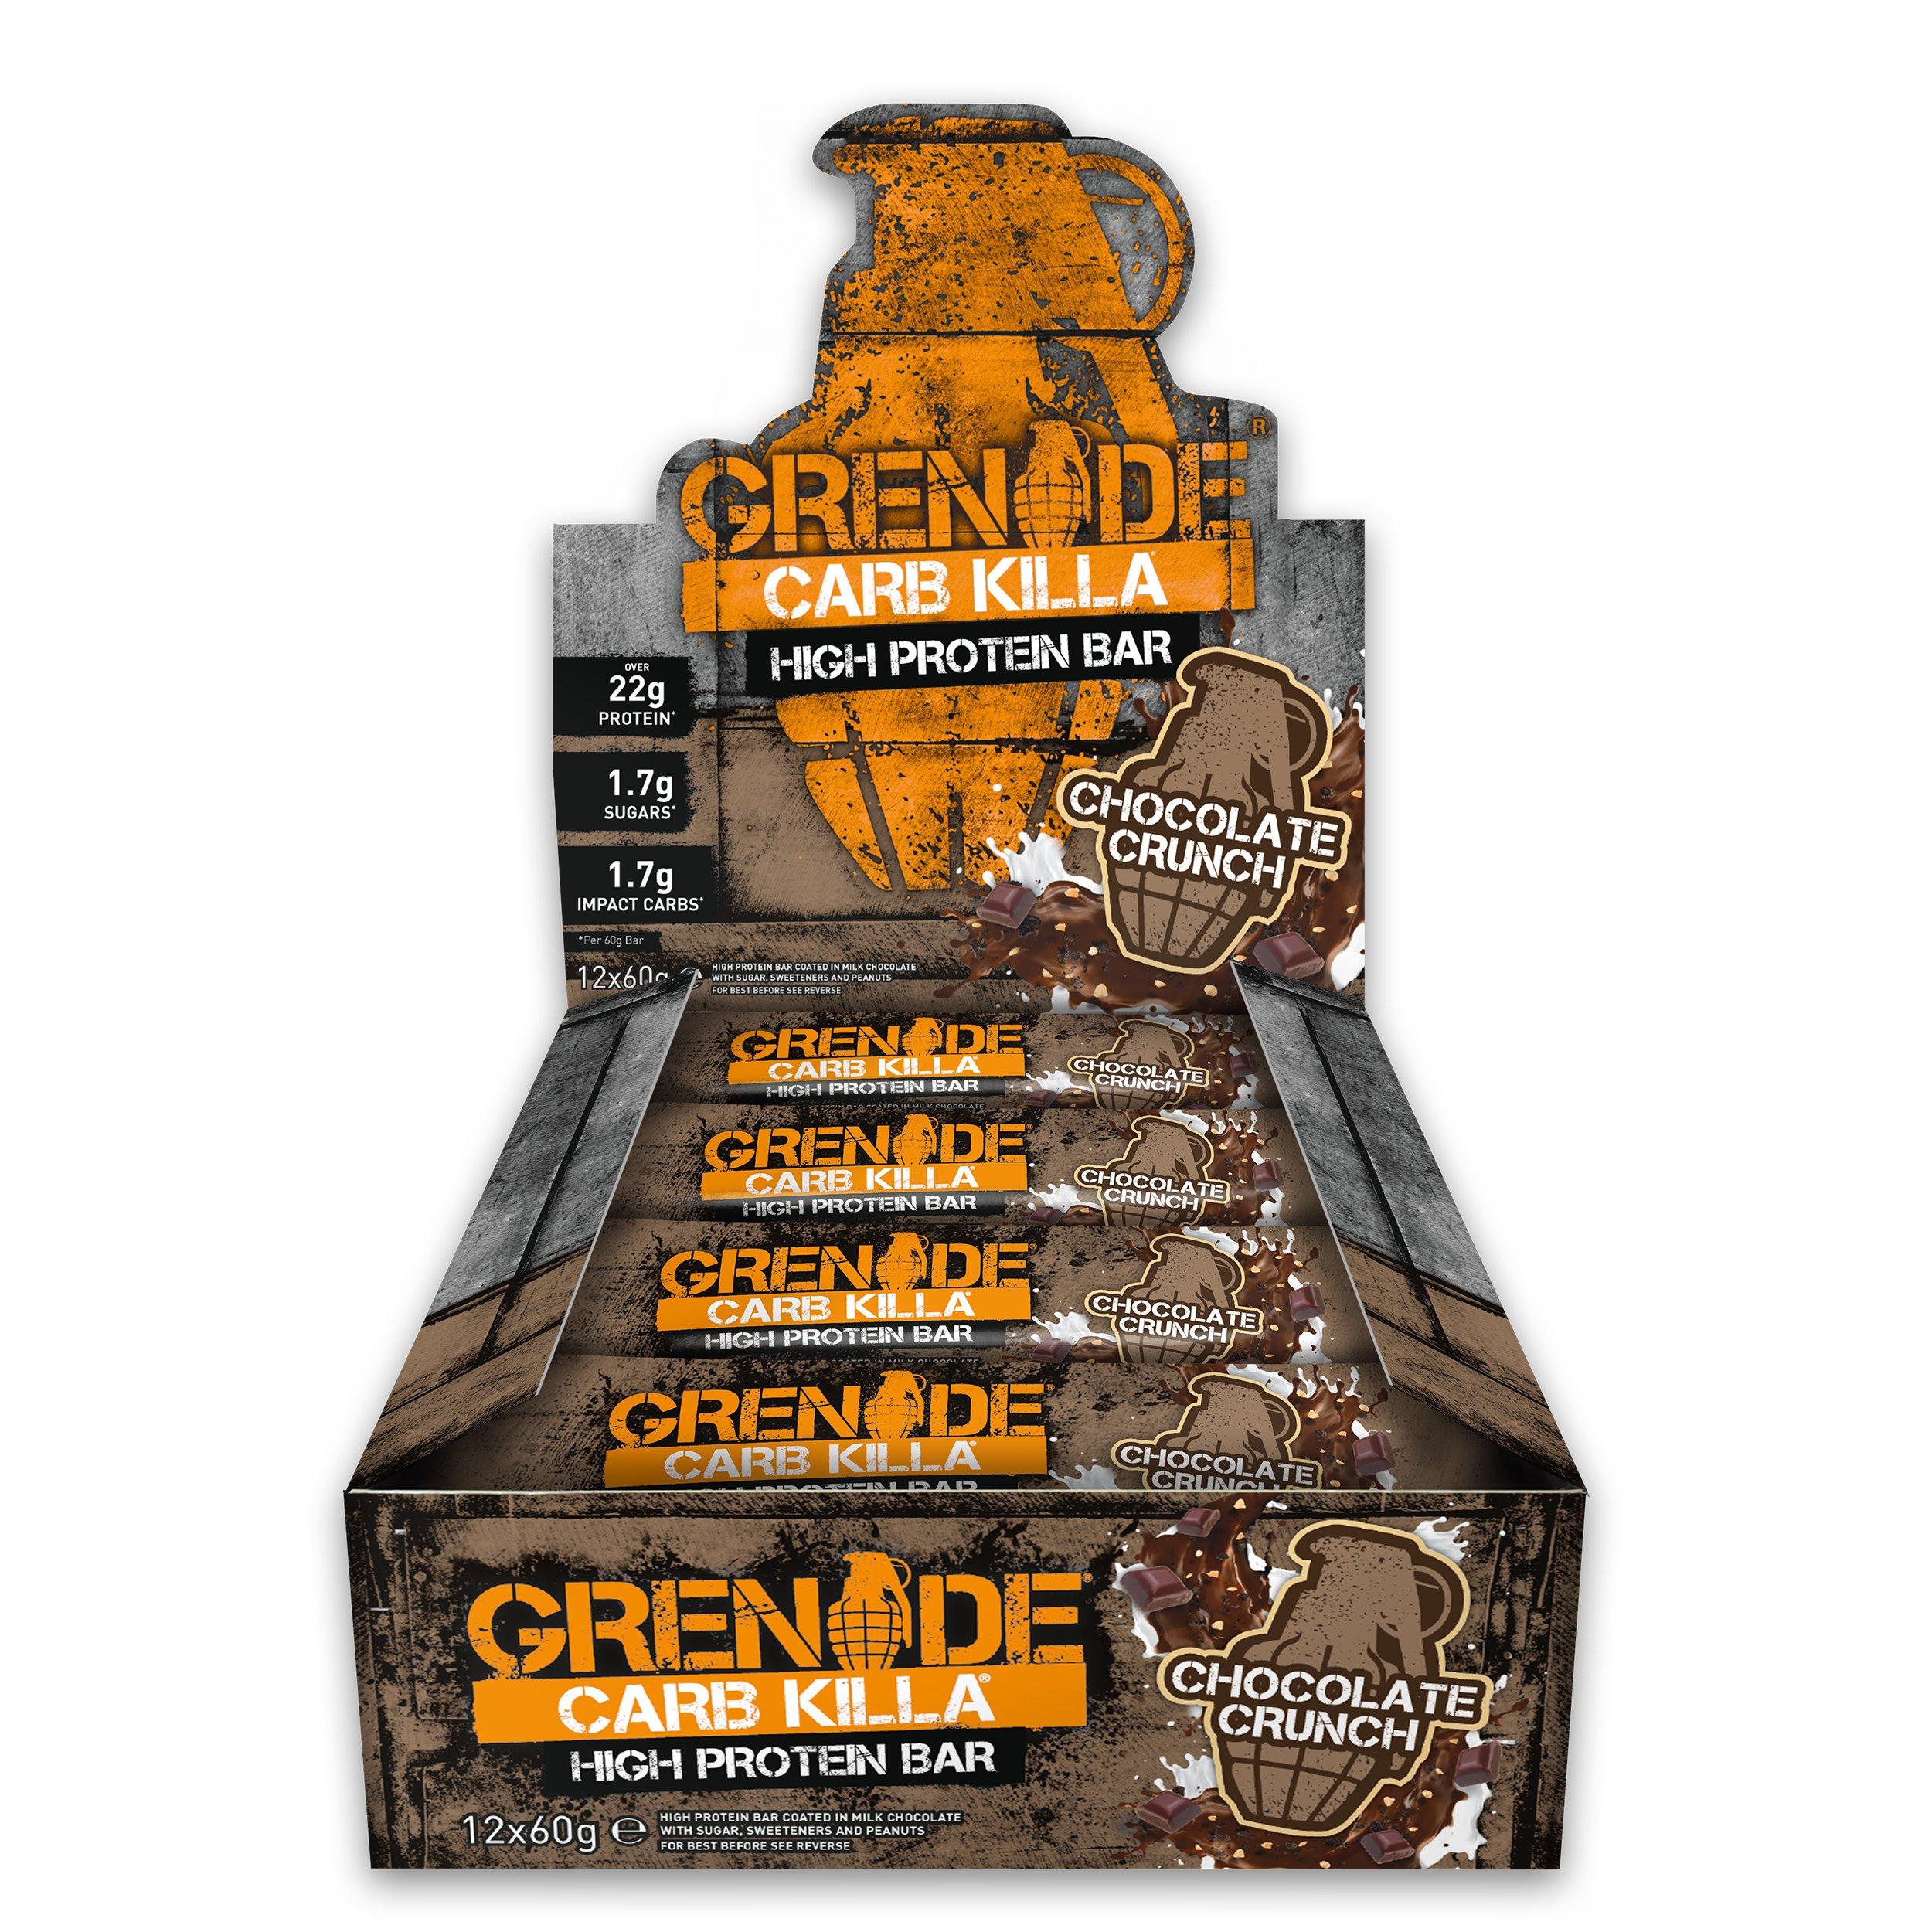 Grenade Carb Killa Bar, Chocolate Crunch, 12 Count